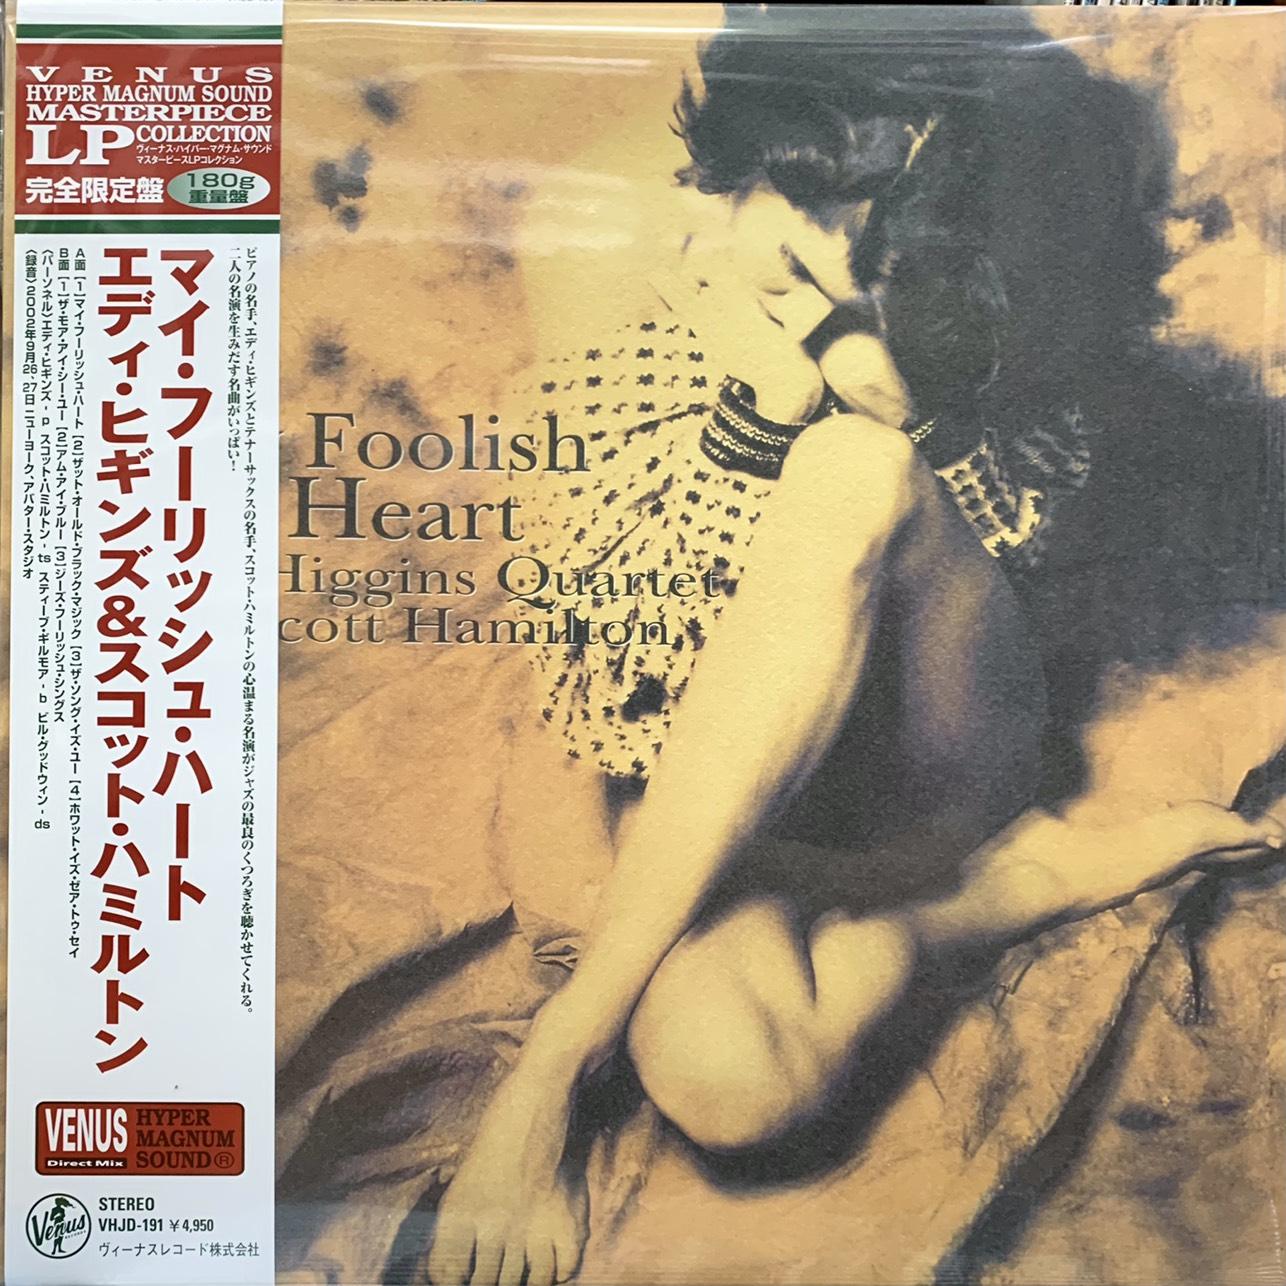 dia-than-vinyl-my-foolish-heart-eddie-higgins-quartet